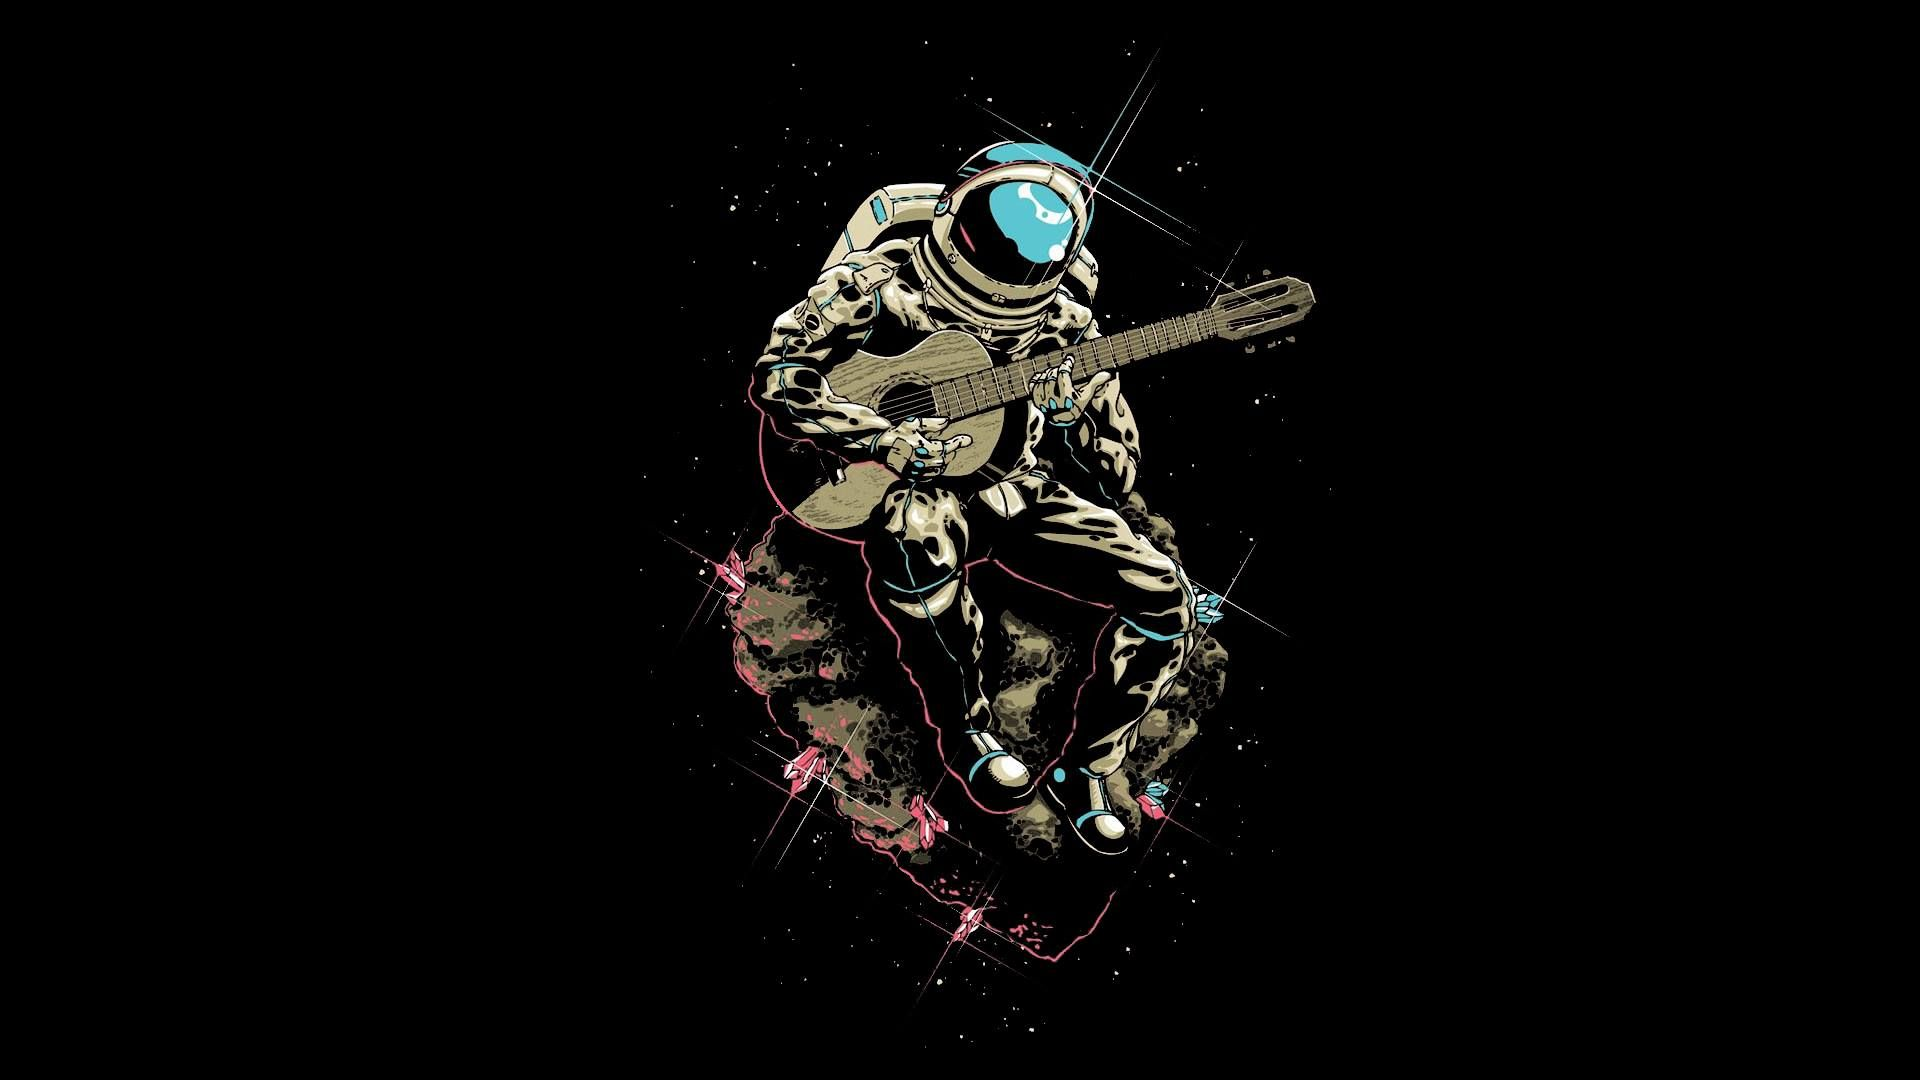 Astronaut Plays Guitar Followme Cooliphone6case On Twitter Facebook Google Instagram Linkedin Blo Astronaut Wallpaper Astronaut Tattoo Guitar Painting